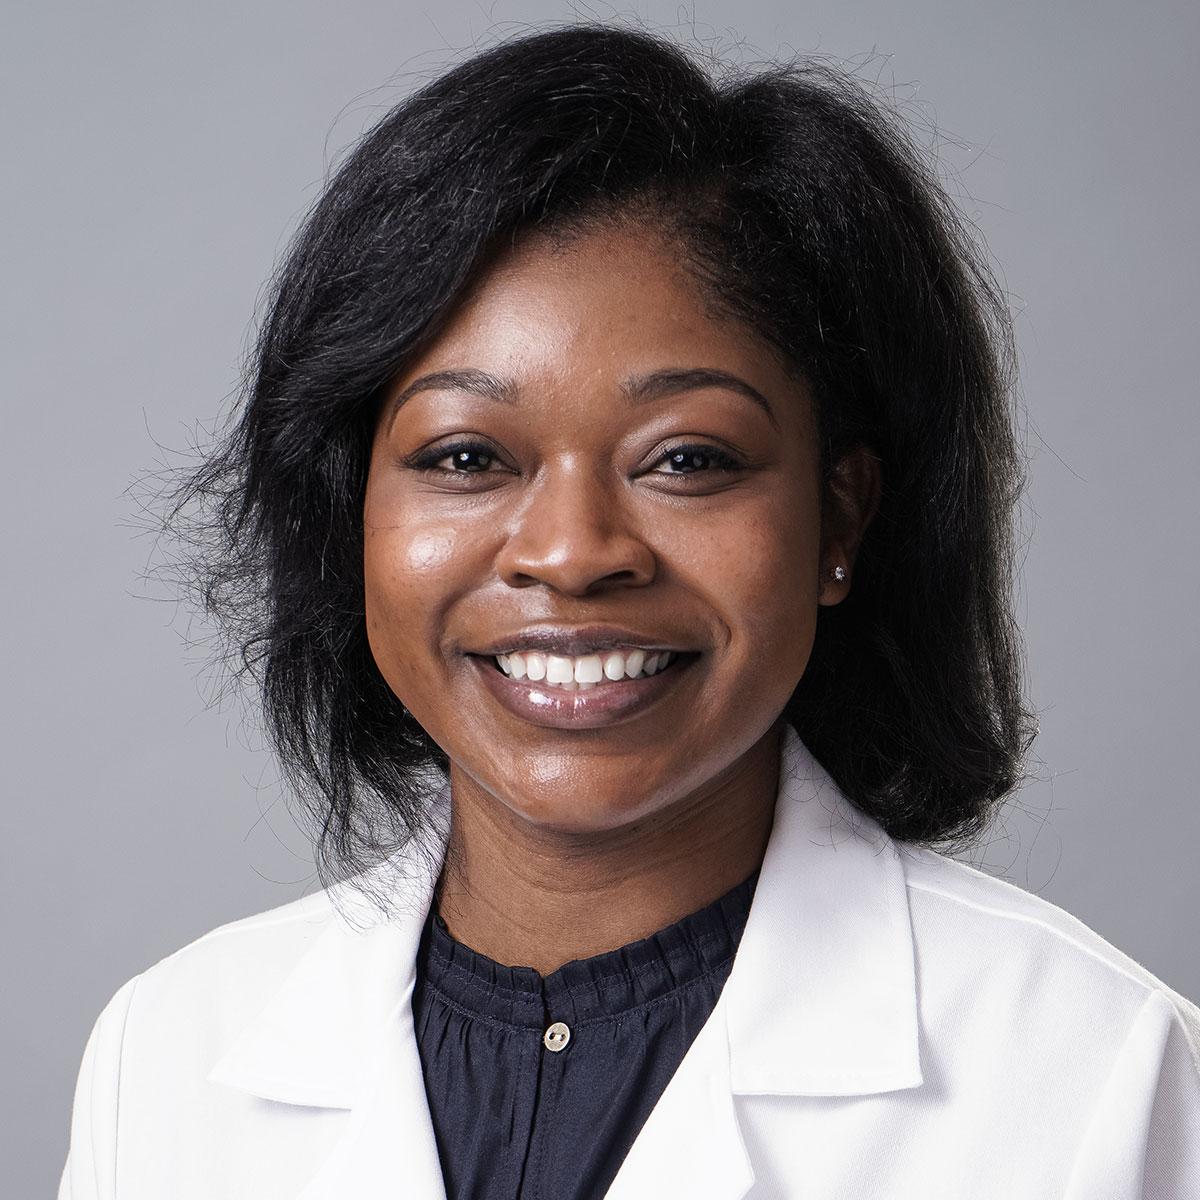 A friendly headshot of Dr. Tyesha Coleman